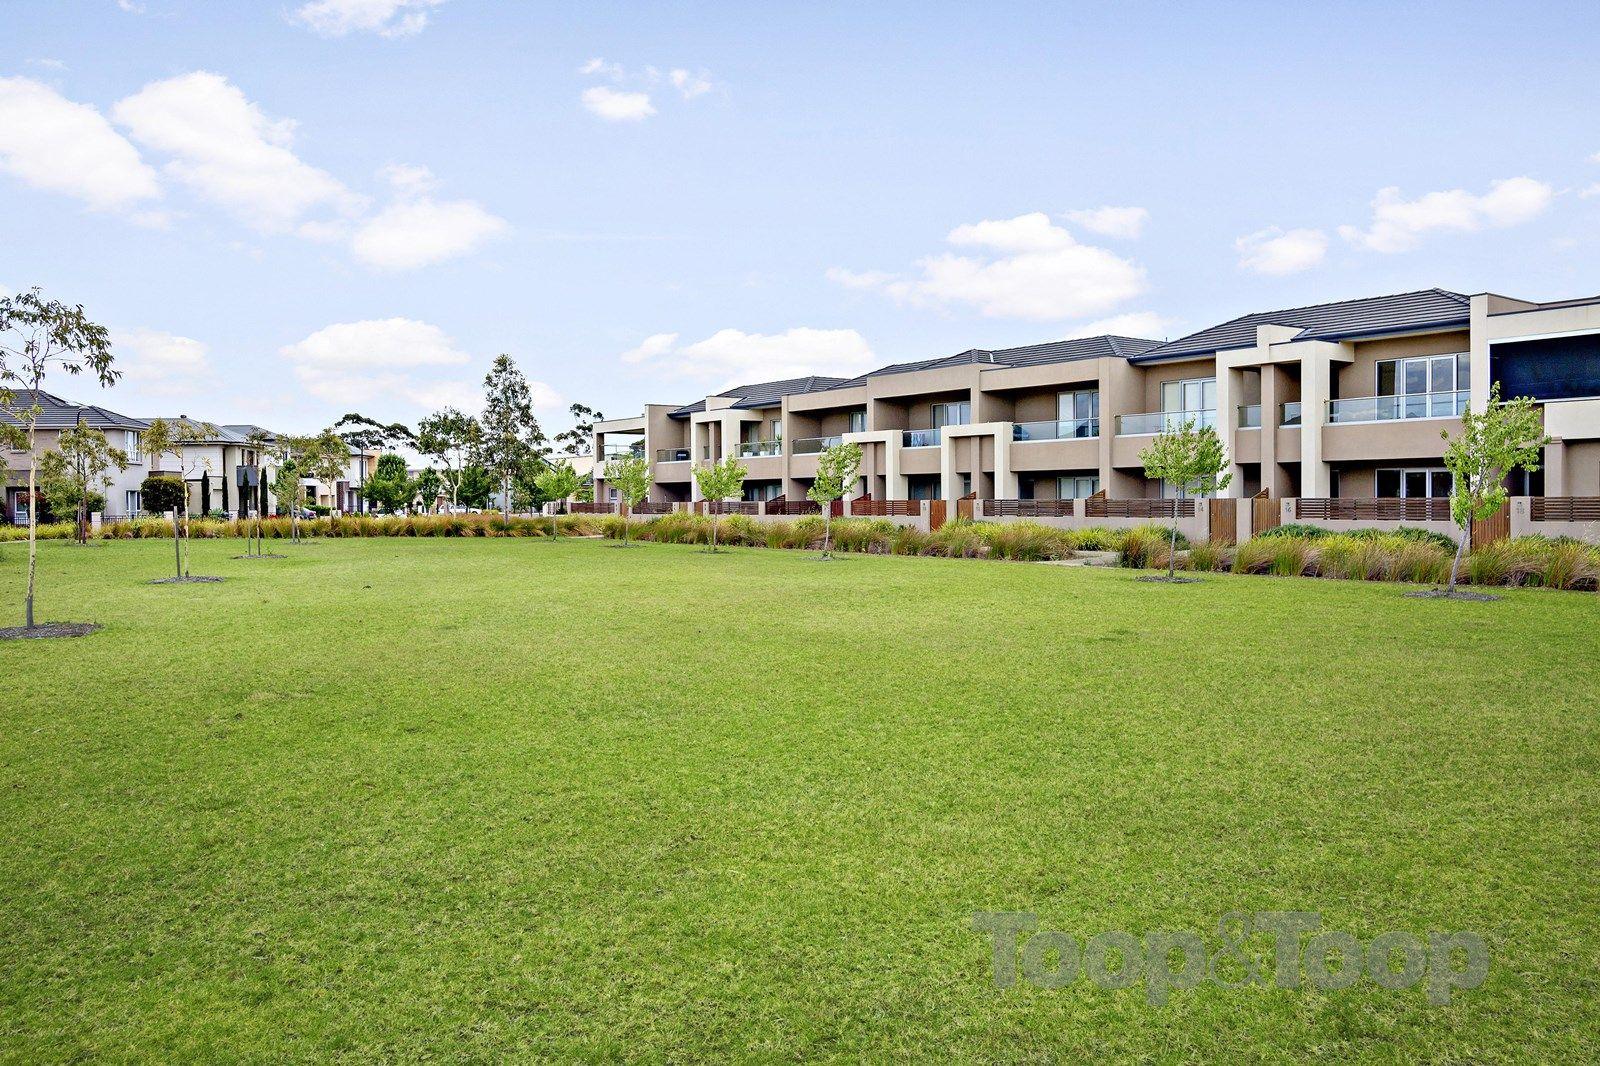 16 Carbone Terrace, St Clair SA 5011, Image 1